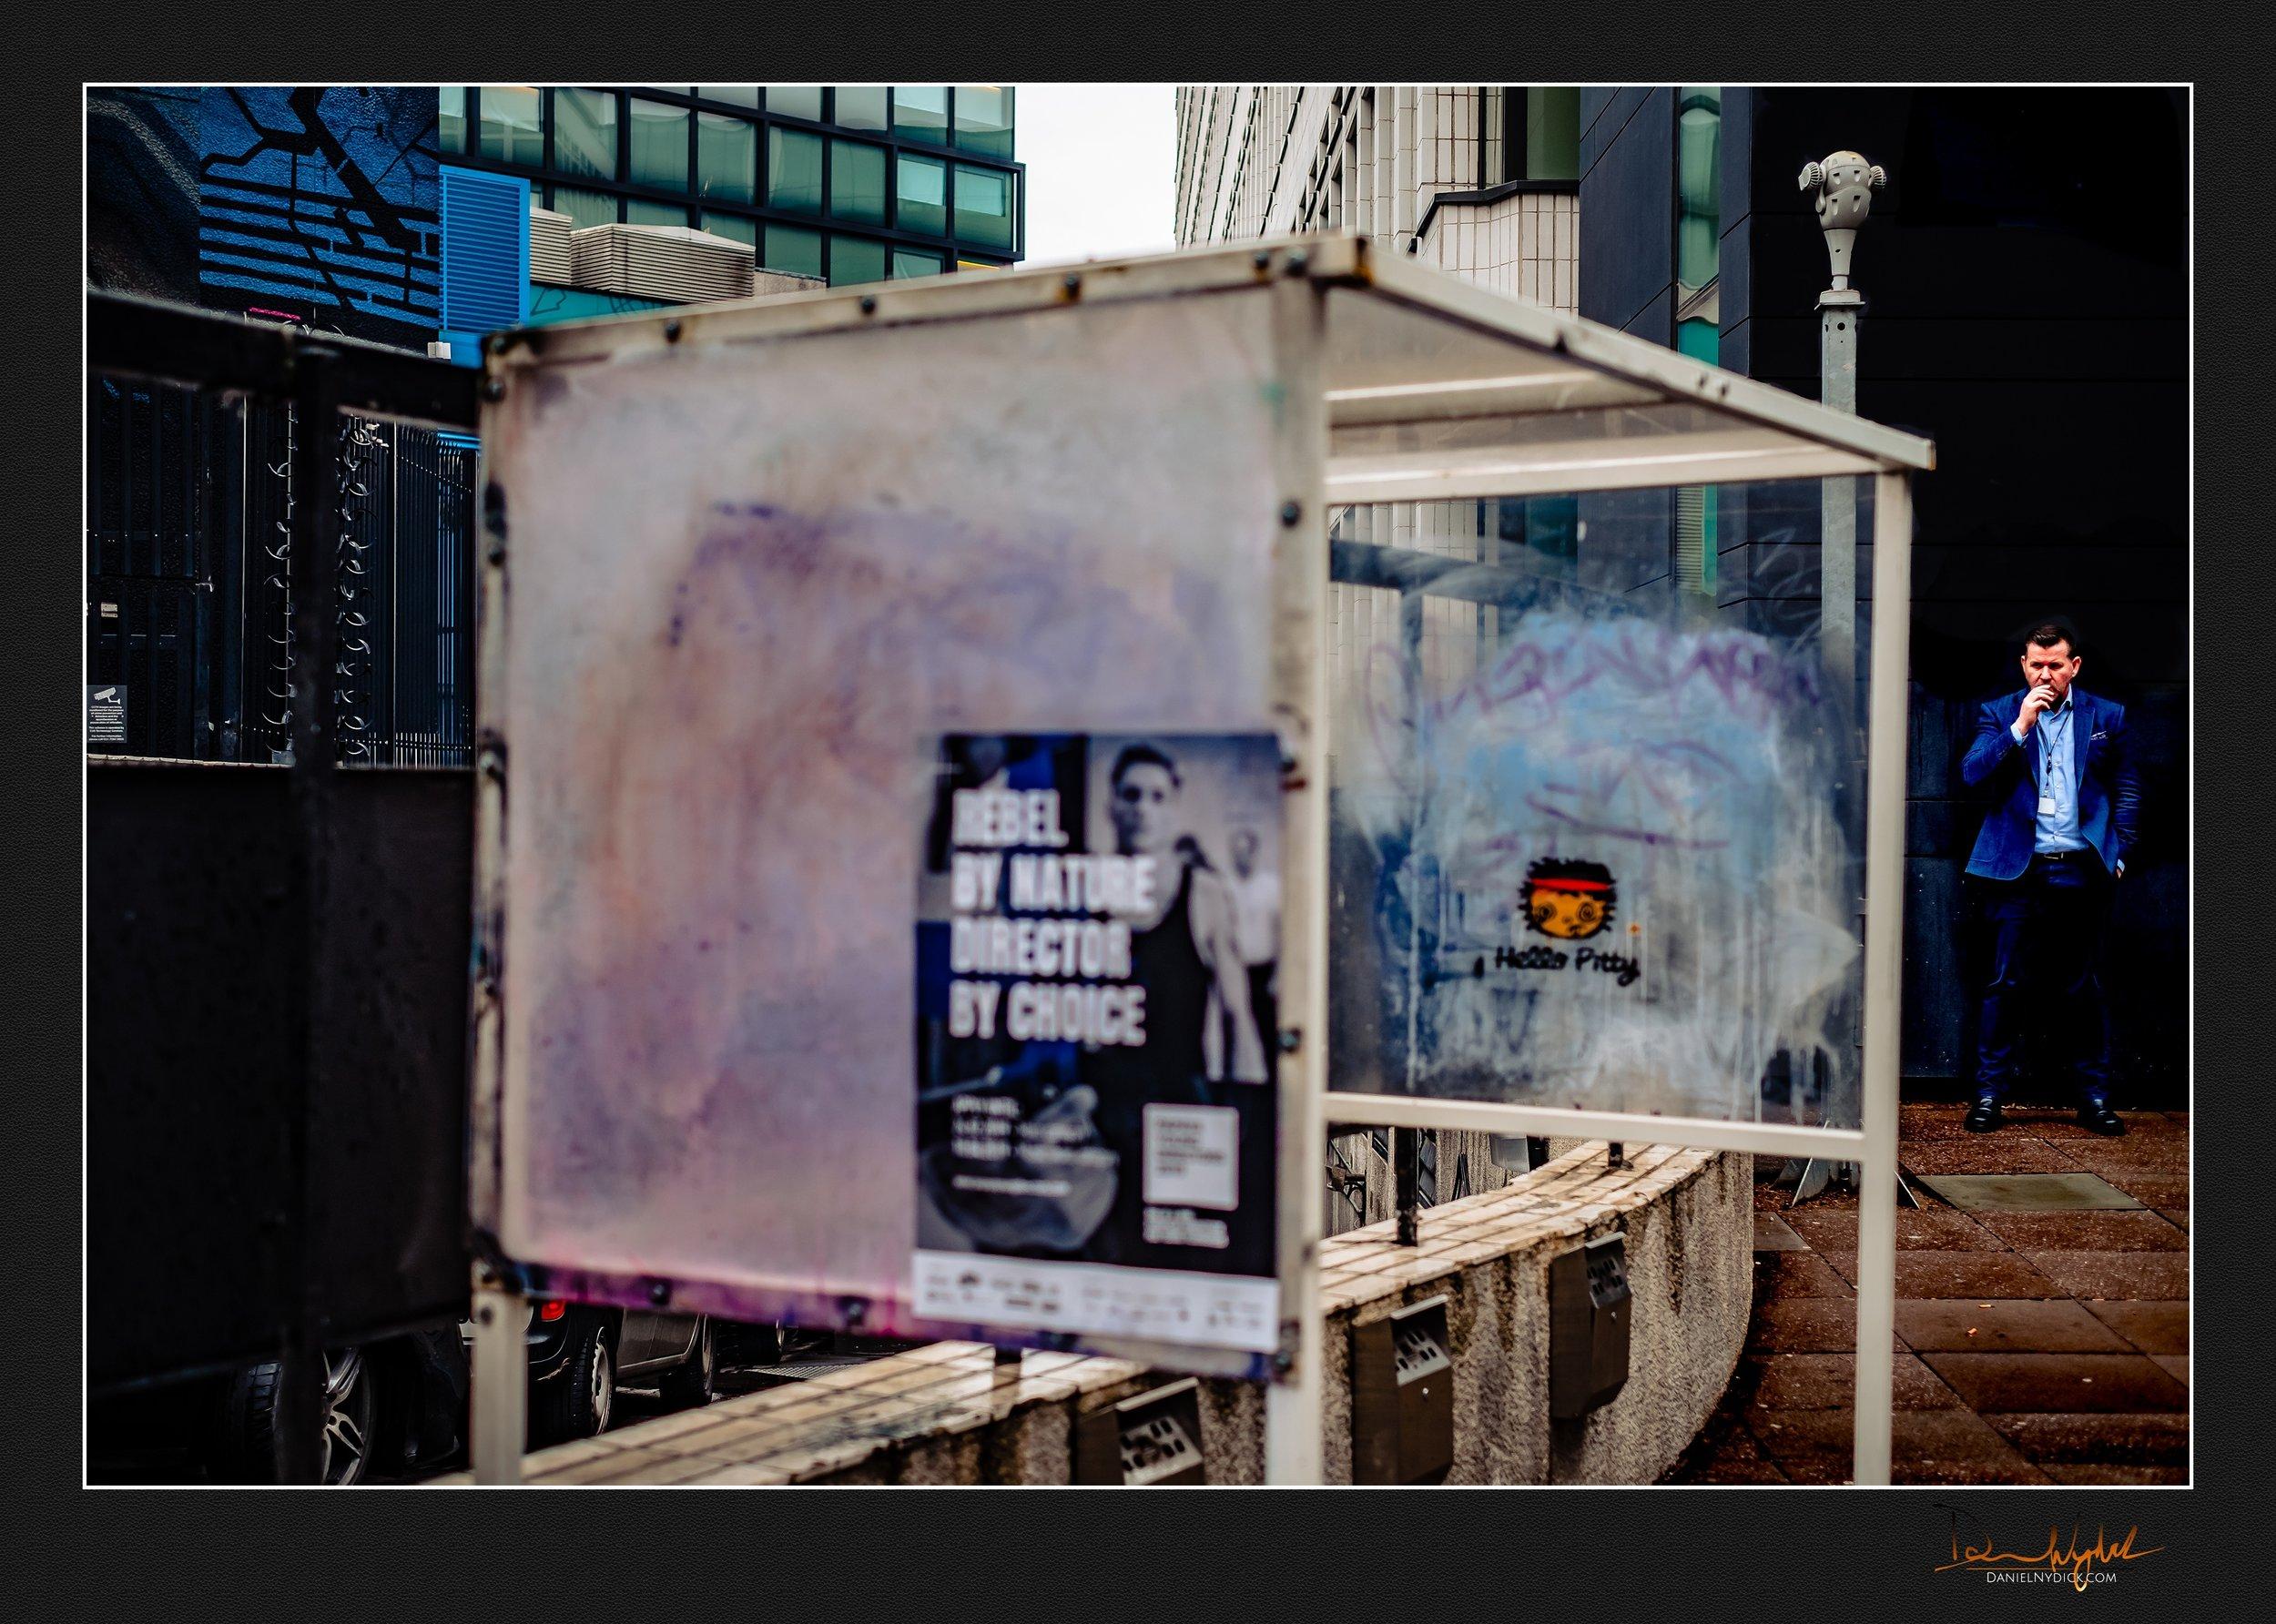 shoreditch, man, candid, public, street scene, smoking